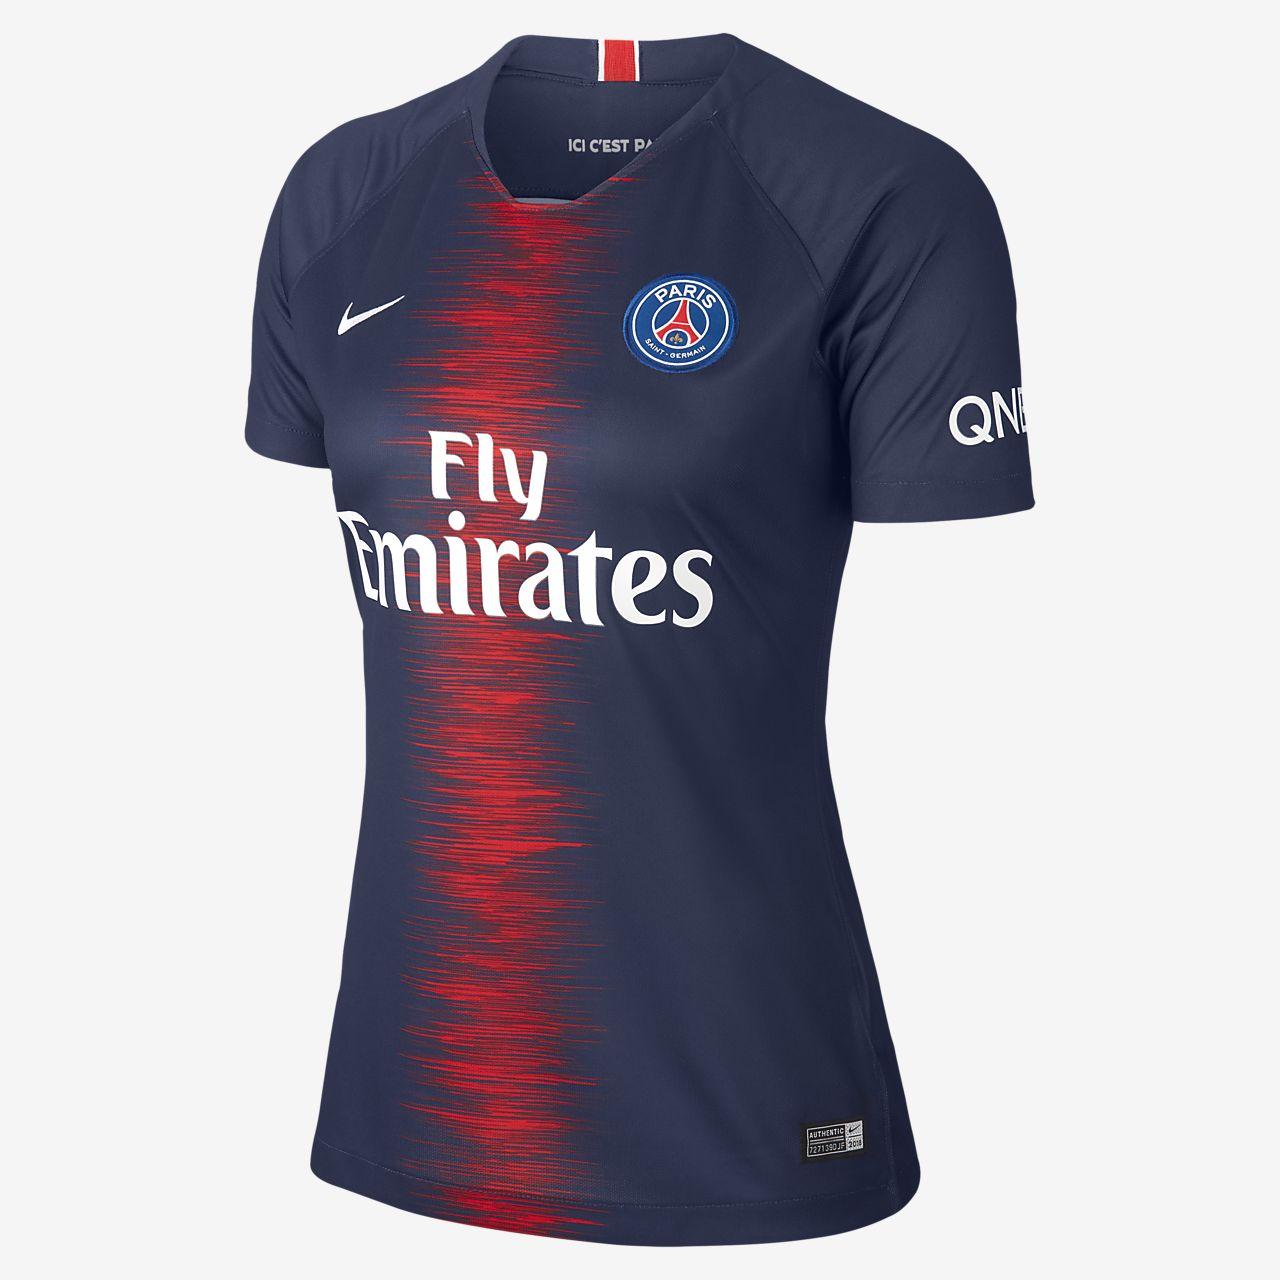 2018/19 Paris Saint-Germain Stadium Home Damen-Fußballtrikot